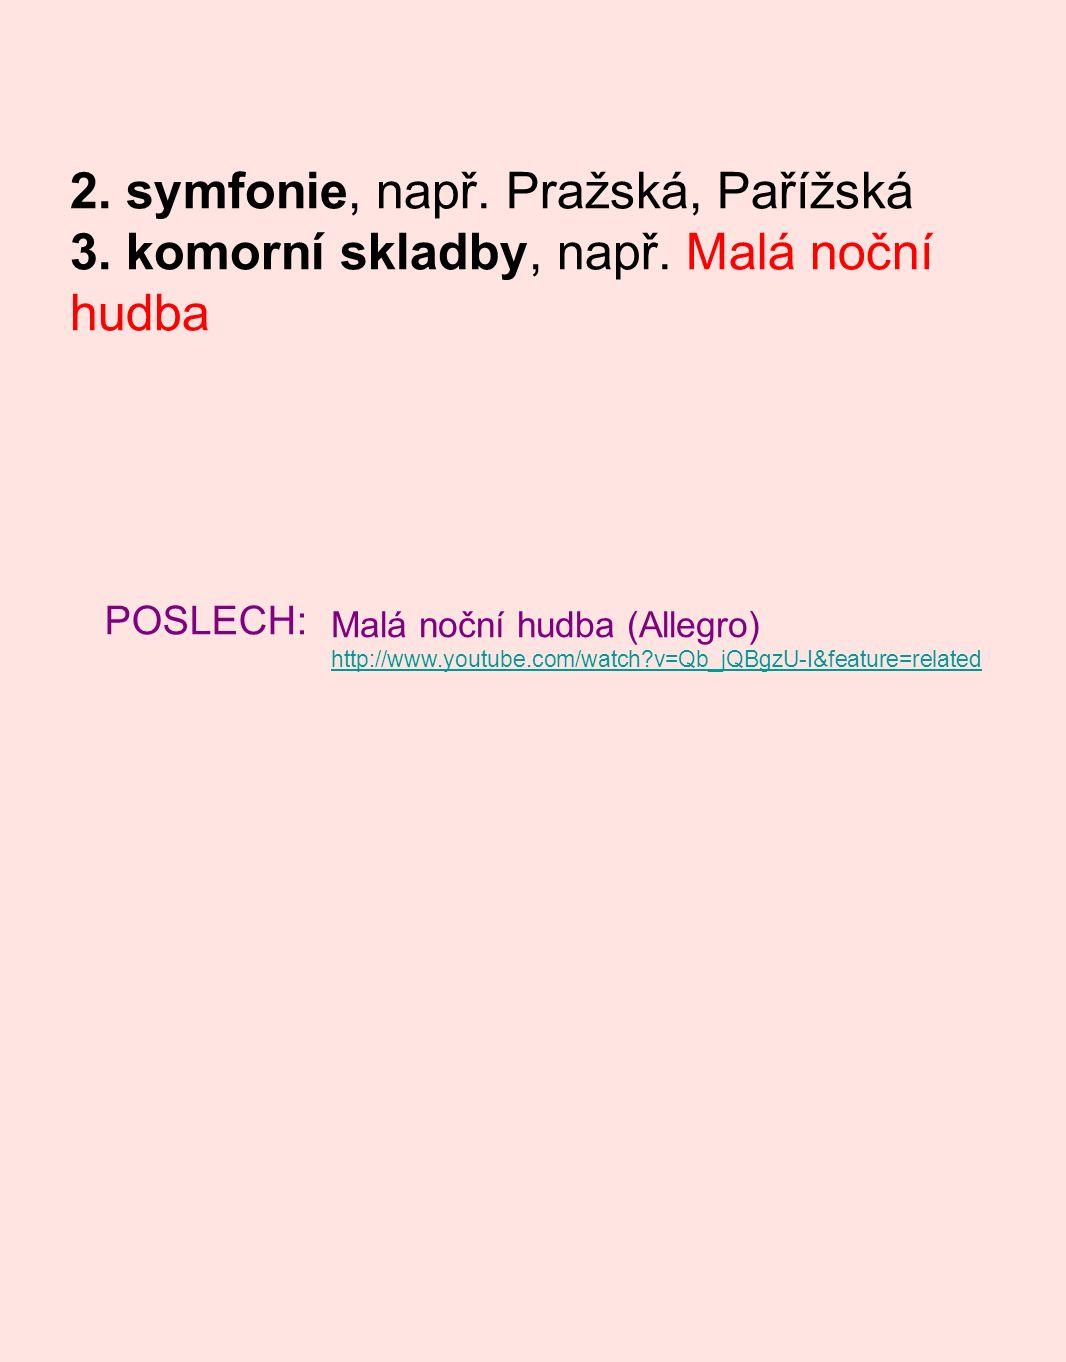 2. symfonie, např. Pražská, Pařížská 3. komorní skladby, např. Malá noční hudba POSLECH: Malá noční hudba (Allegro) http://www.youtube.com/watch?v=Qb_